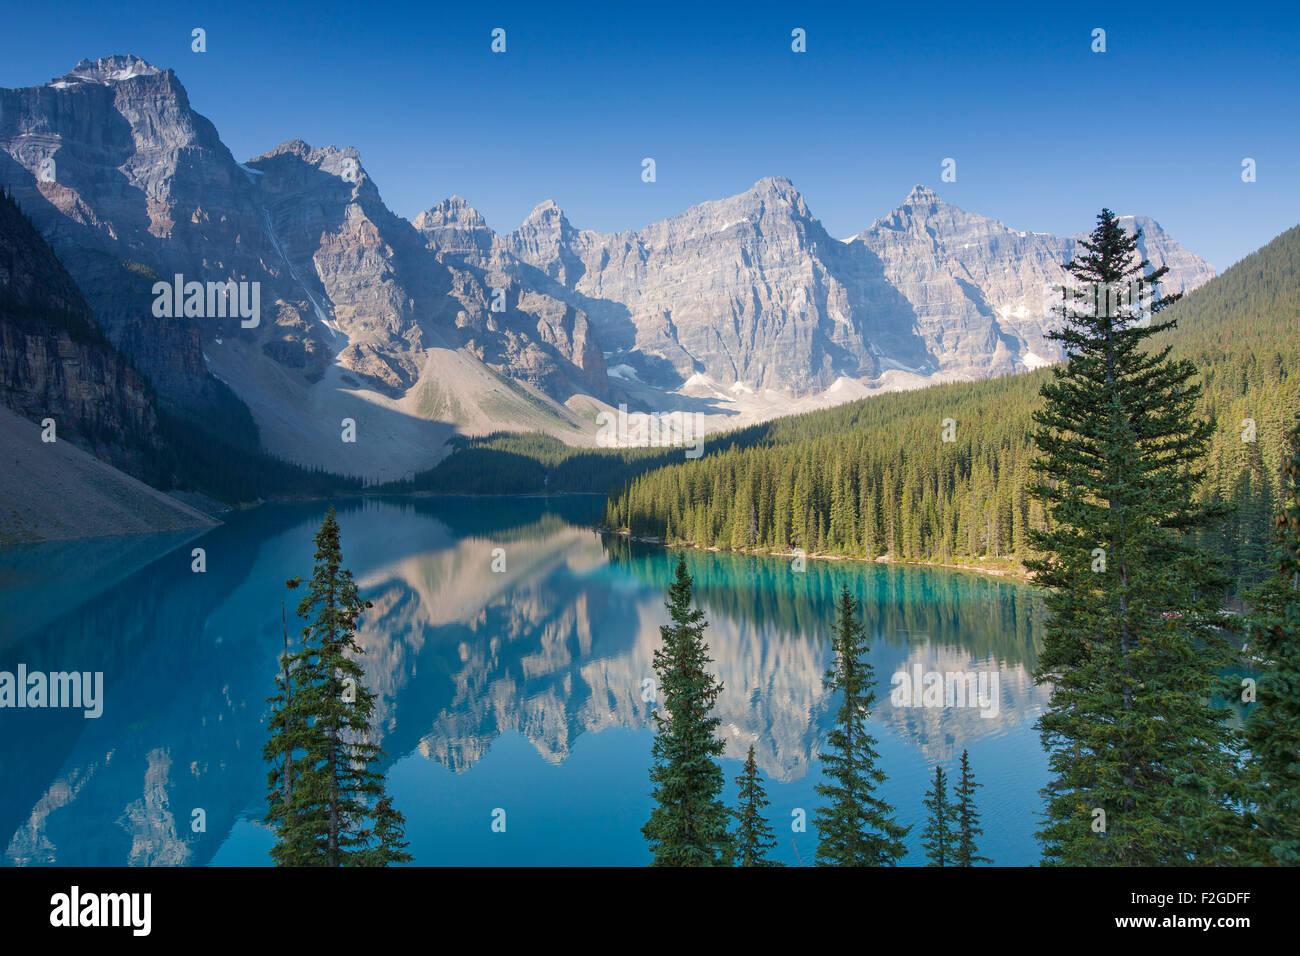 Glazial-Moraine Lake im Valley of the Ten Peaks, Banff Nationalpark, Alberta, Kanada Stockbild